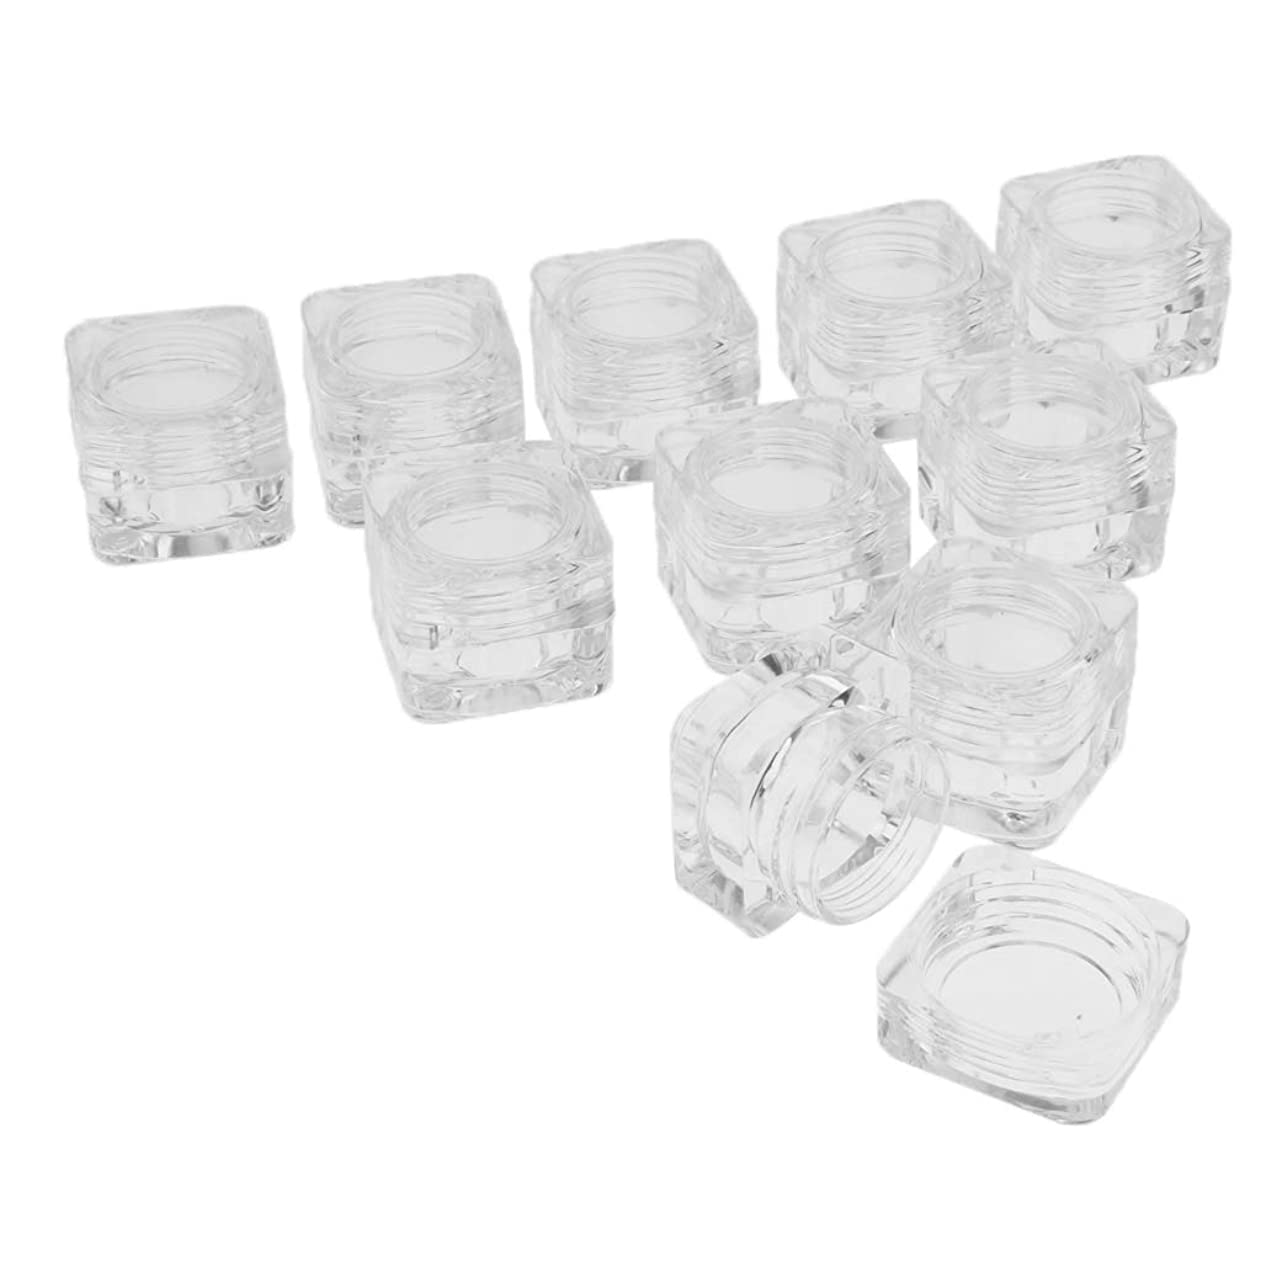 Perfeclan 10個 プラスチックジャー コスメ 収納ケース 透明 クリームジャー リップクリームコンテナ